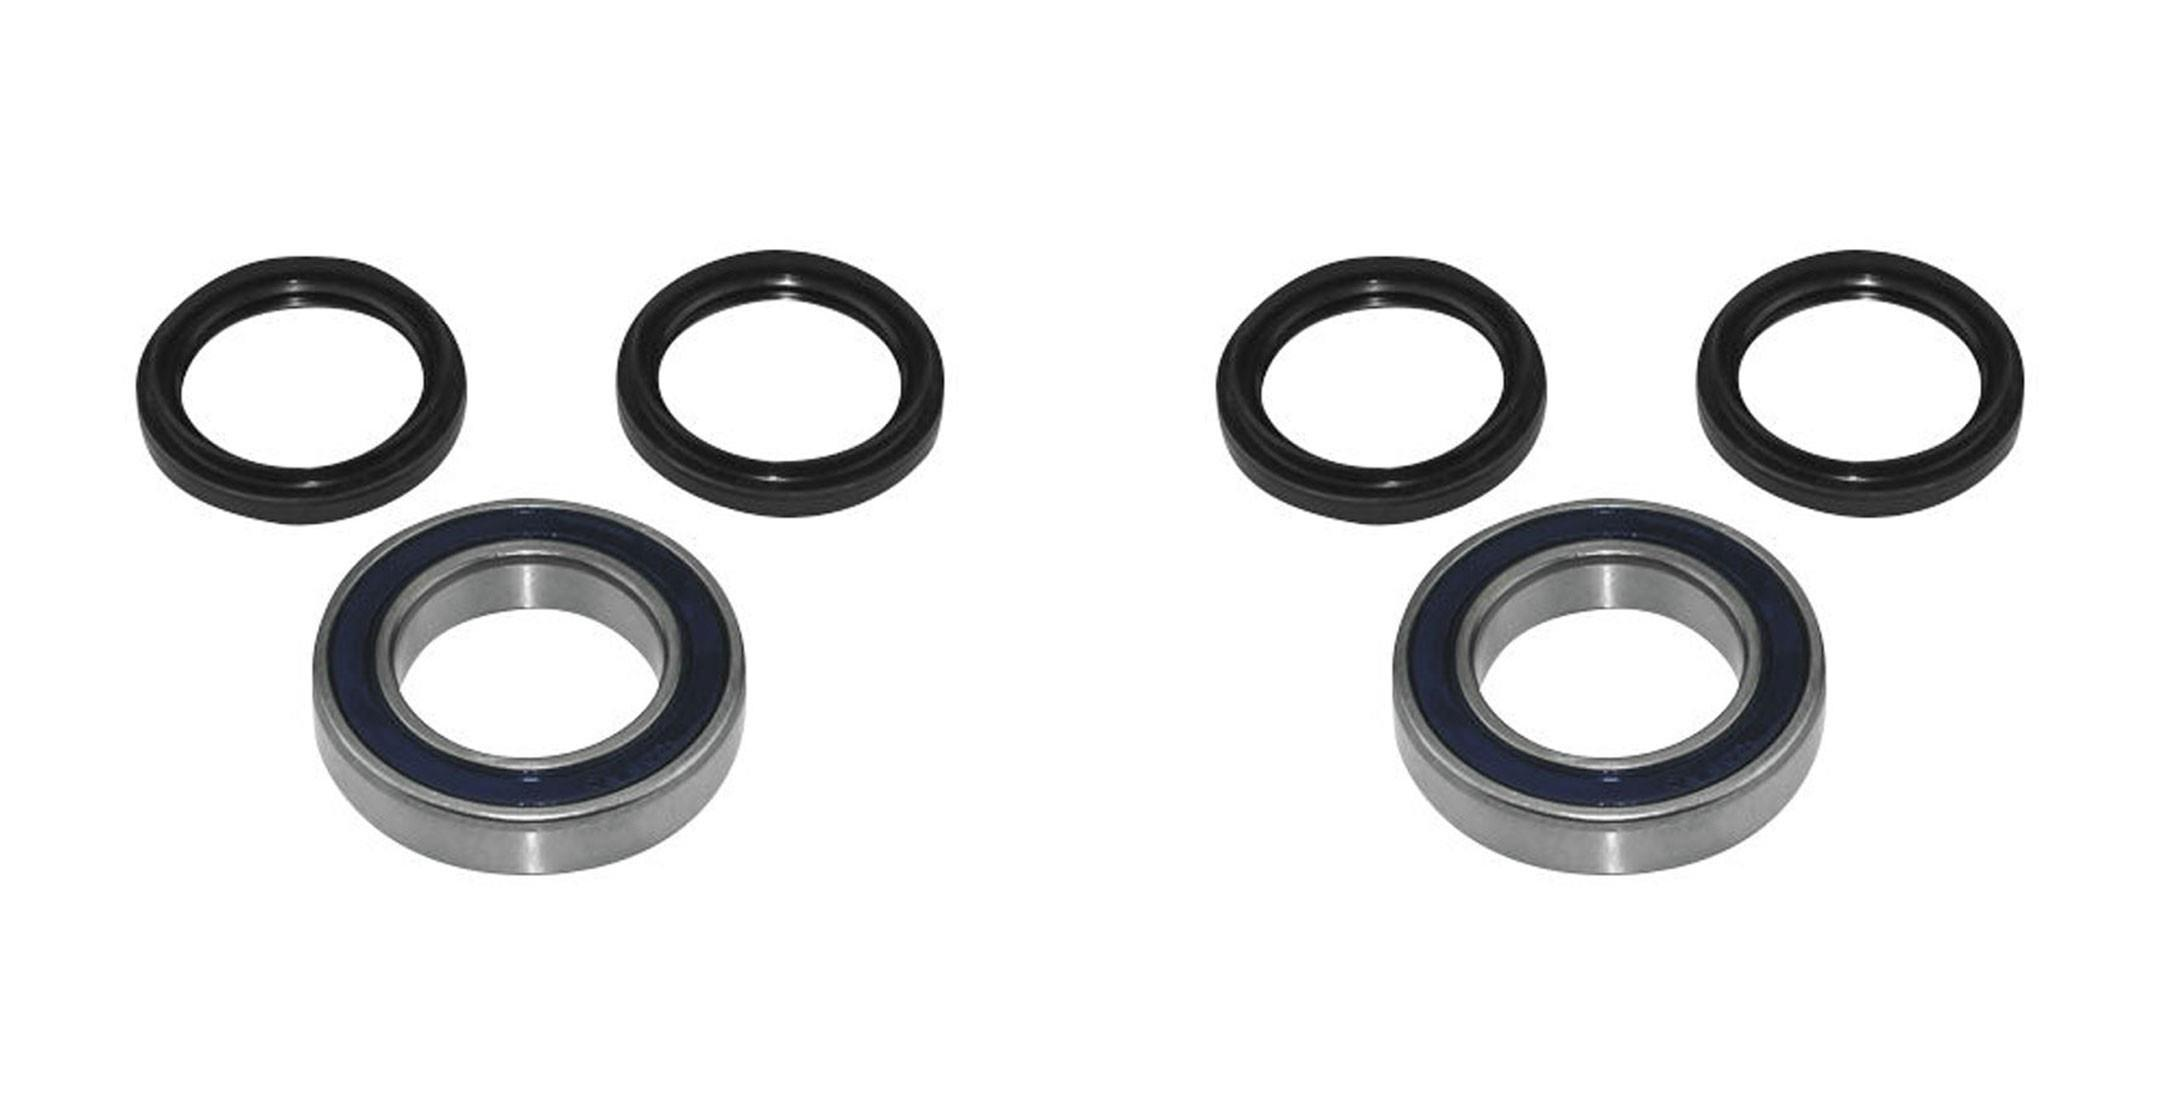 QUADBOSS Rear Wheel Bearing Kits for Honda TRX500FM 2014